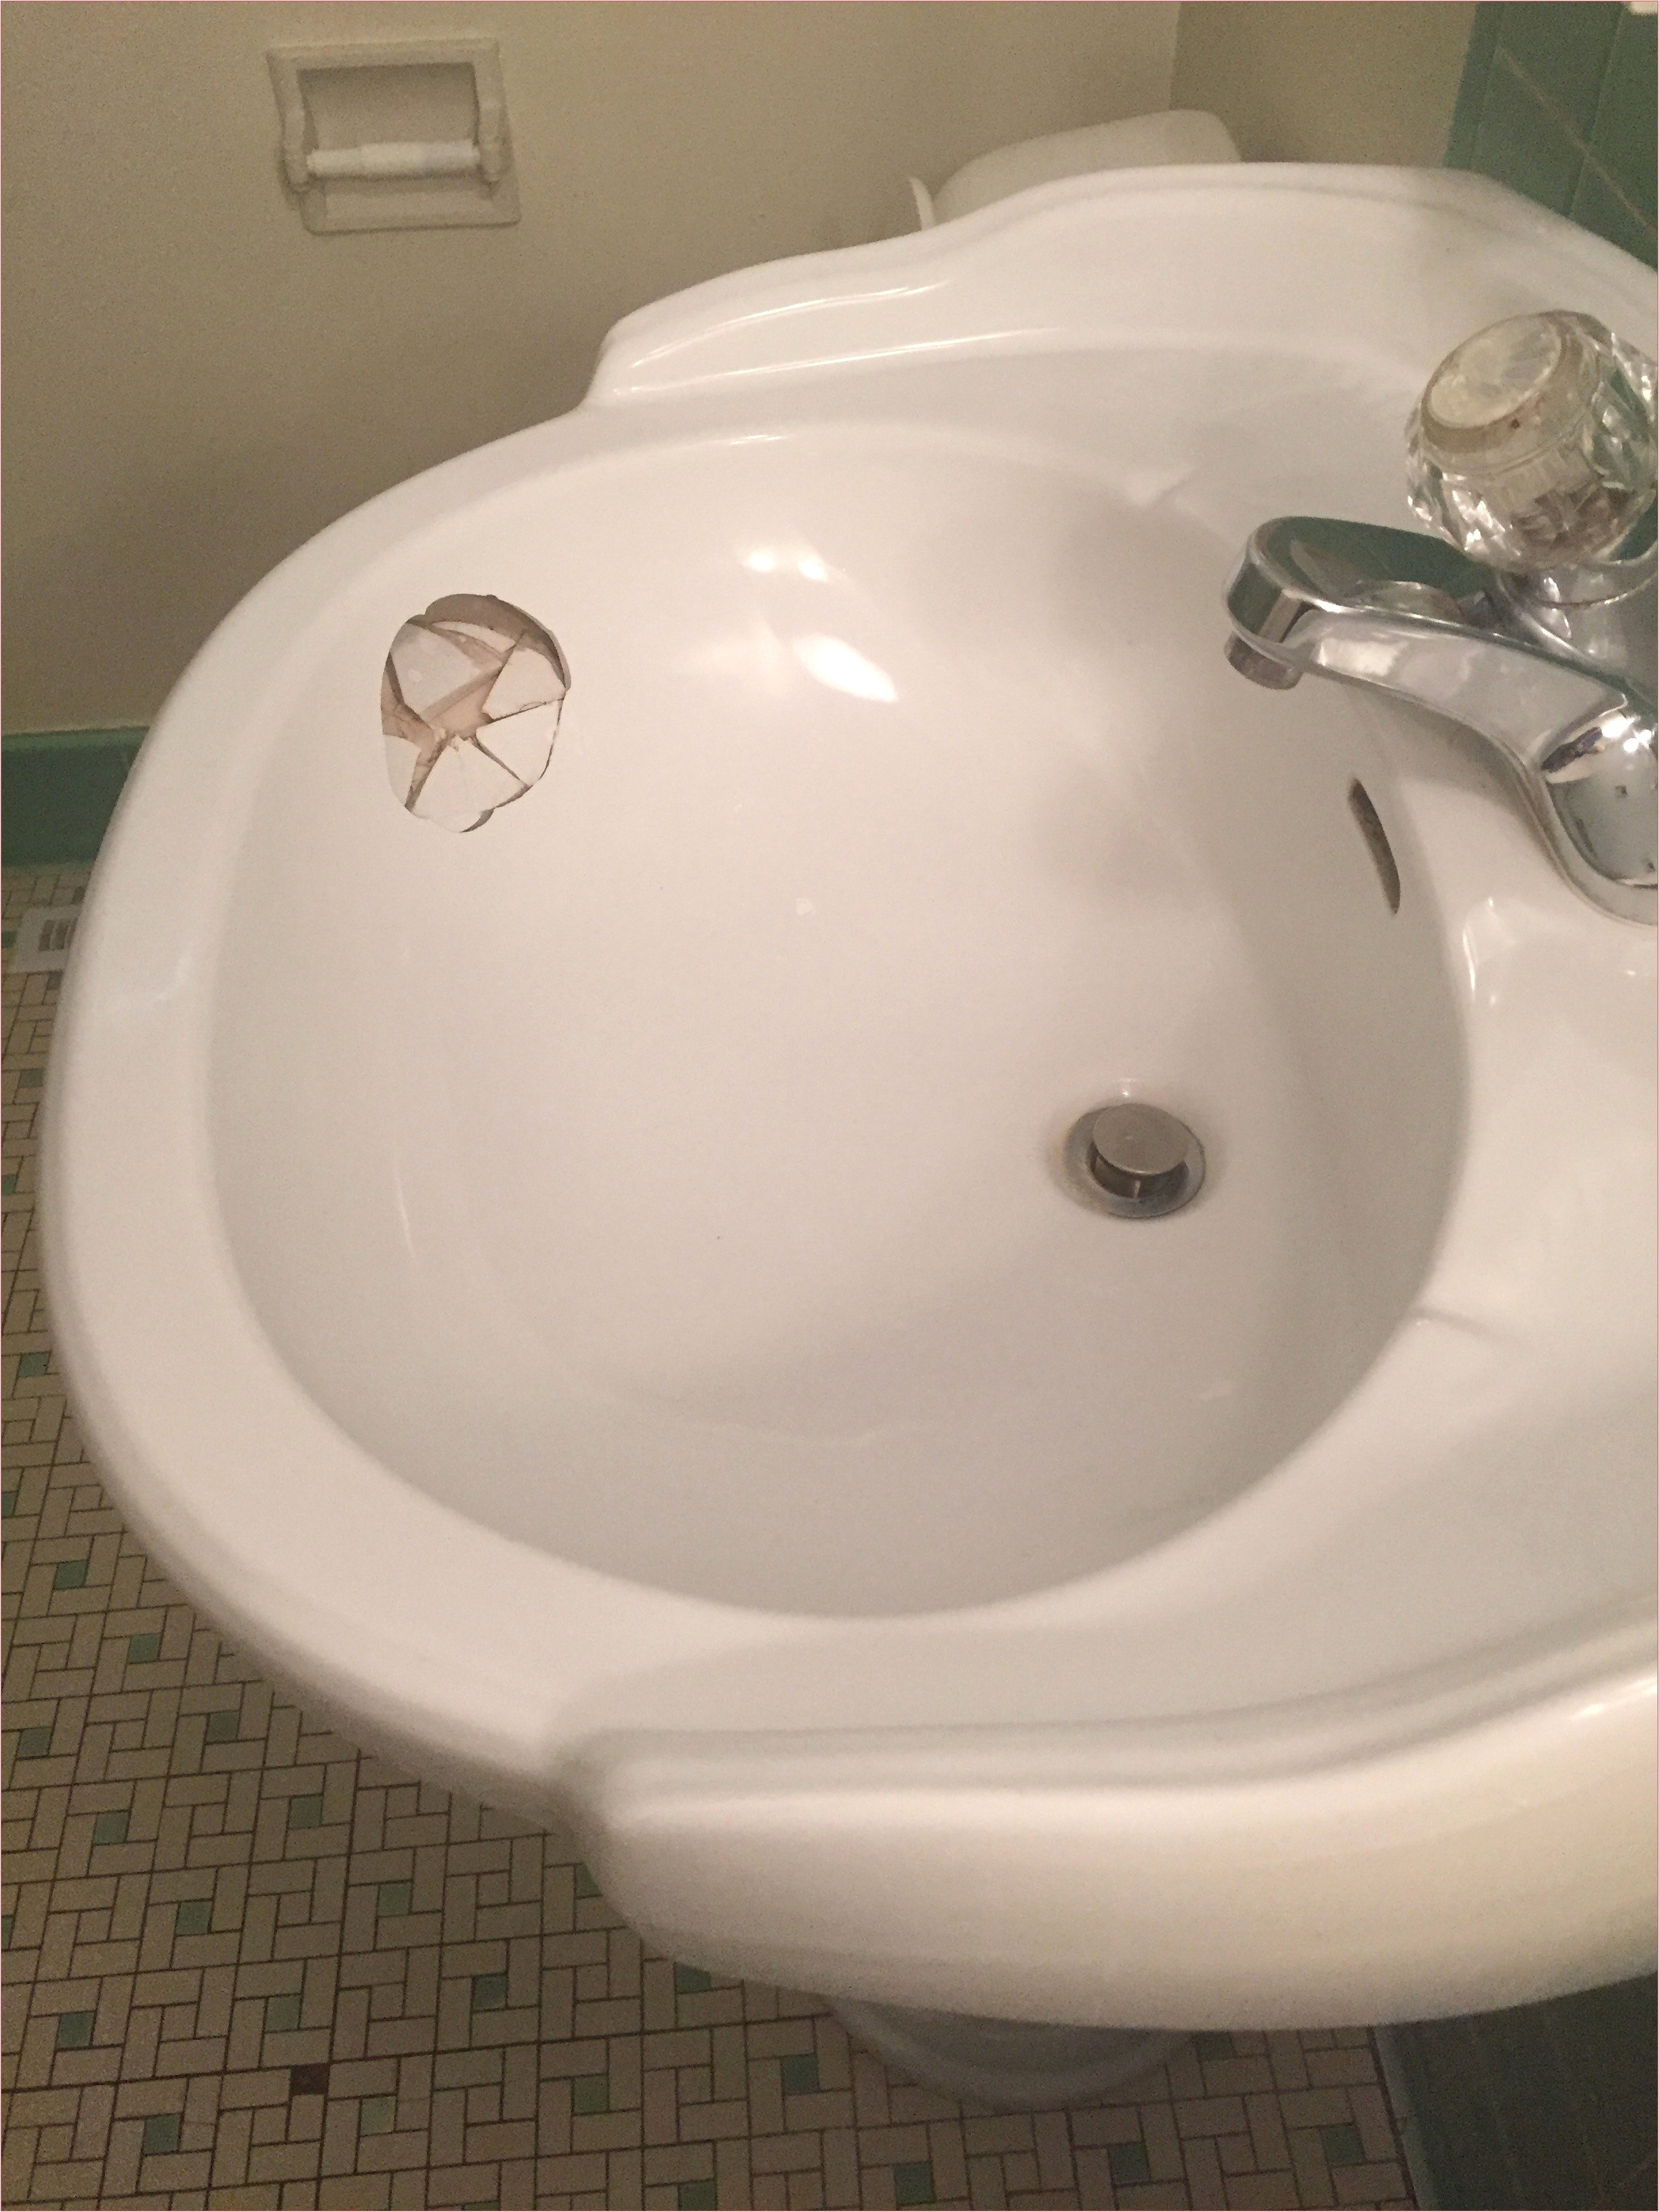 reglazing bathtub luxury shower reglazing unique bathtubs reglazing 0d